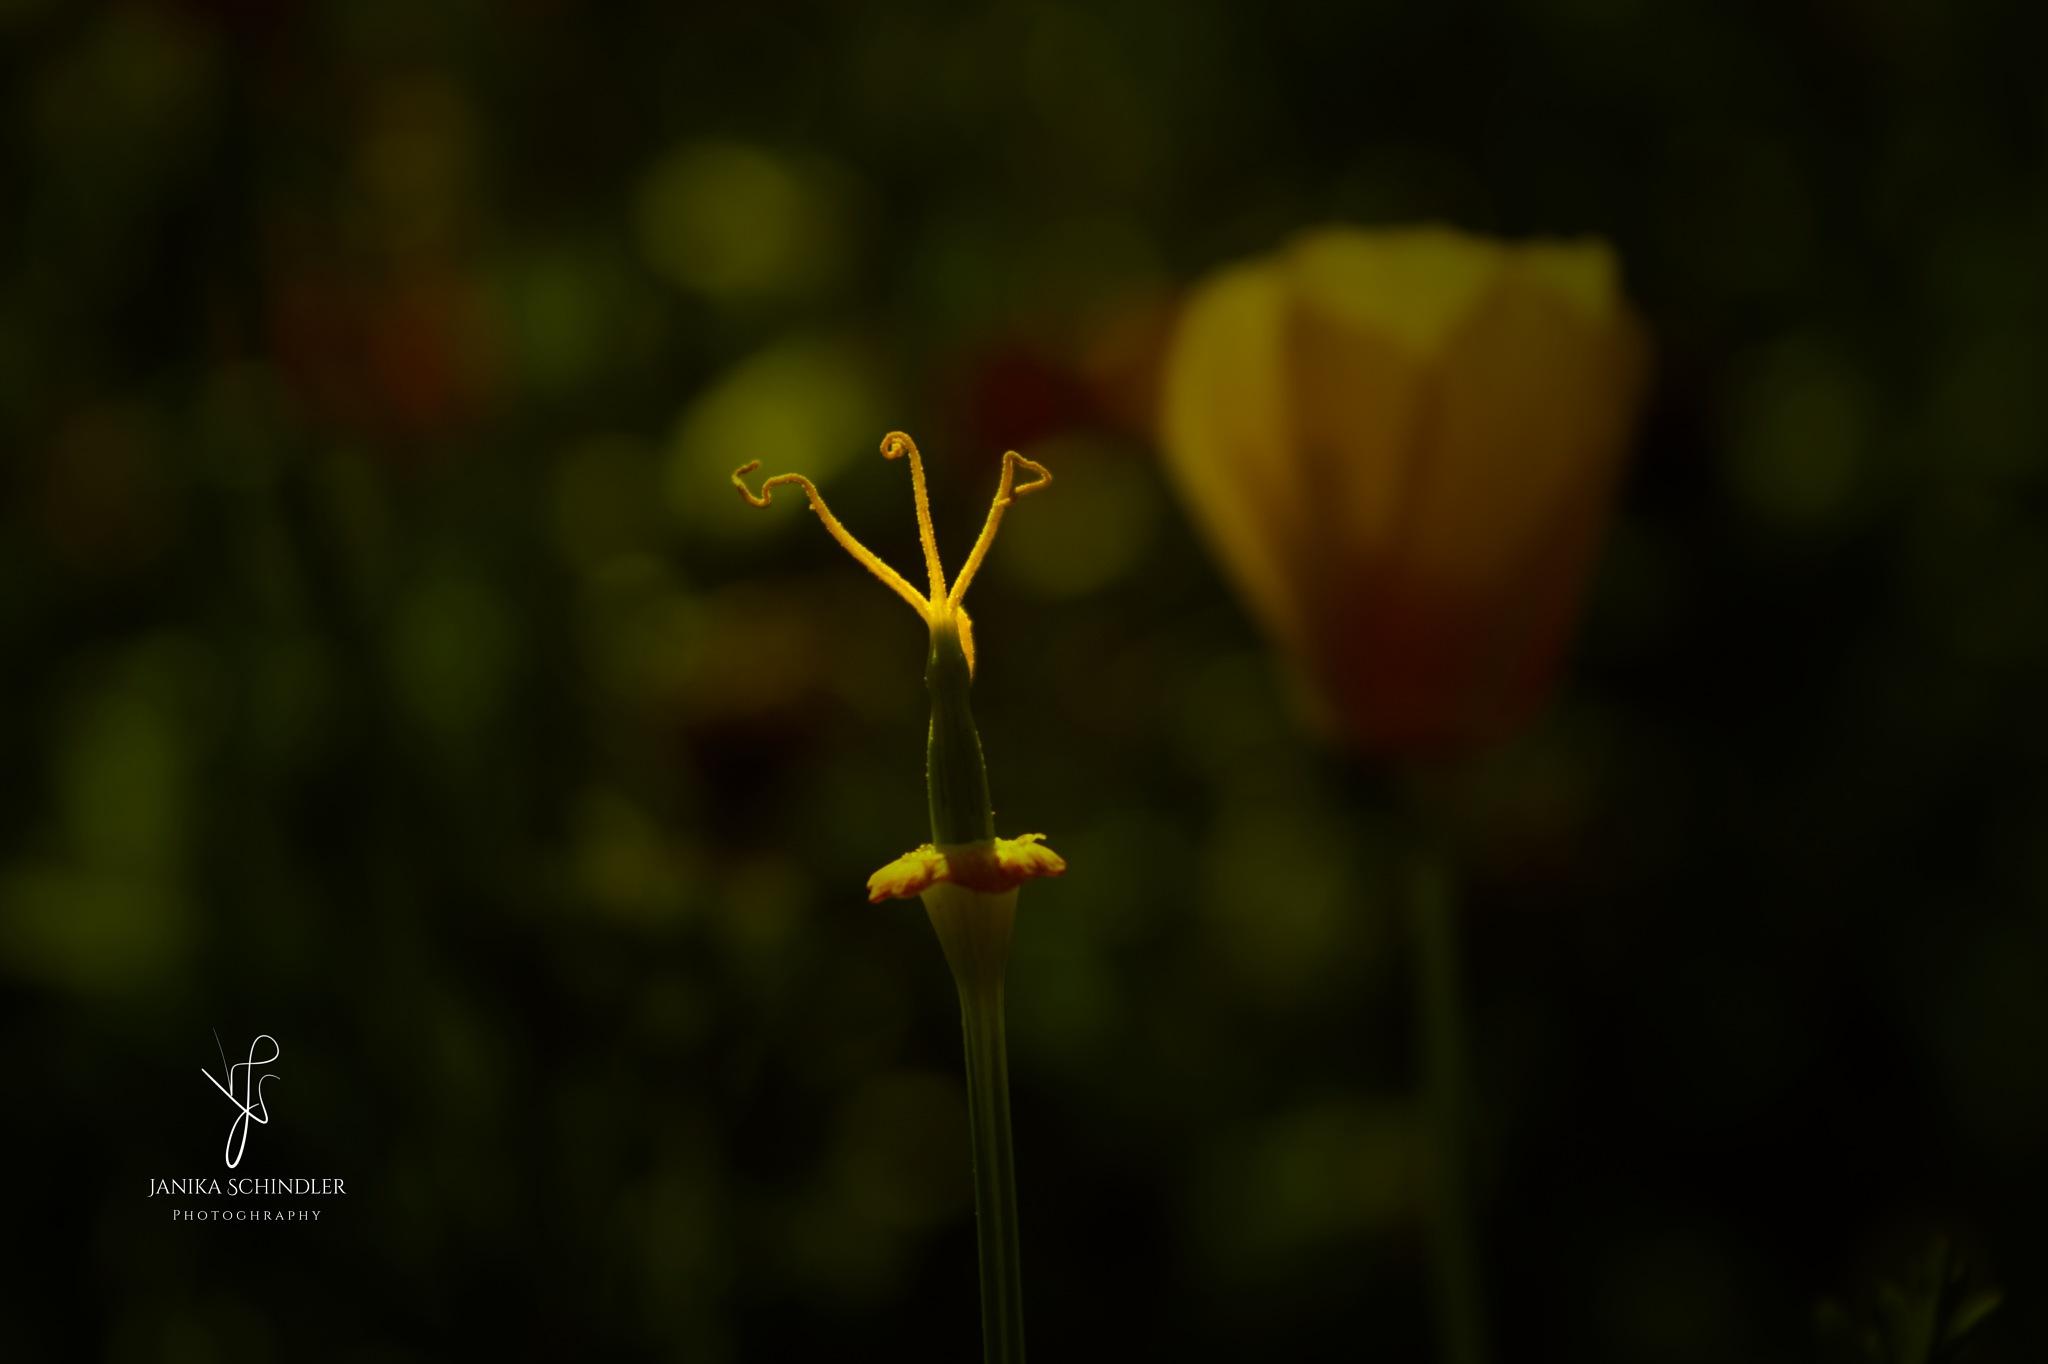 Flower skeleton by Janika Schindler